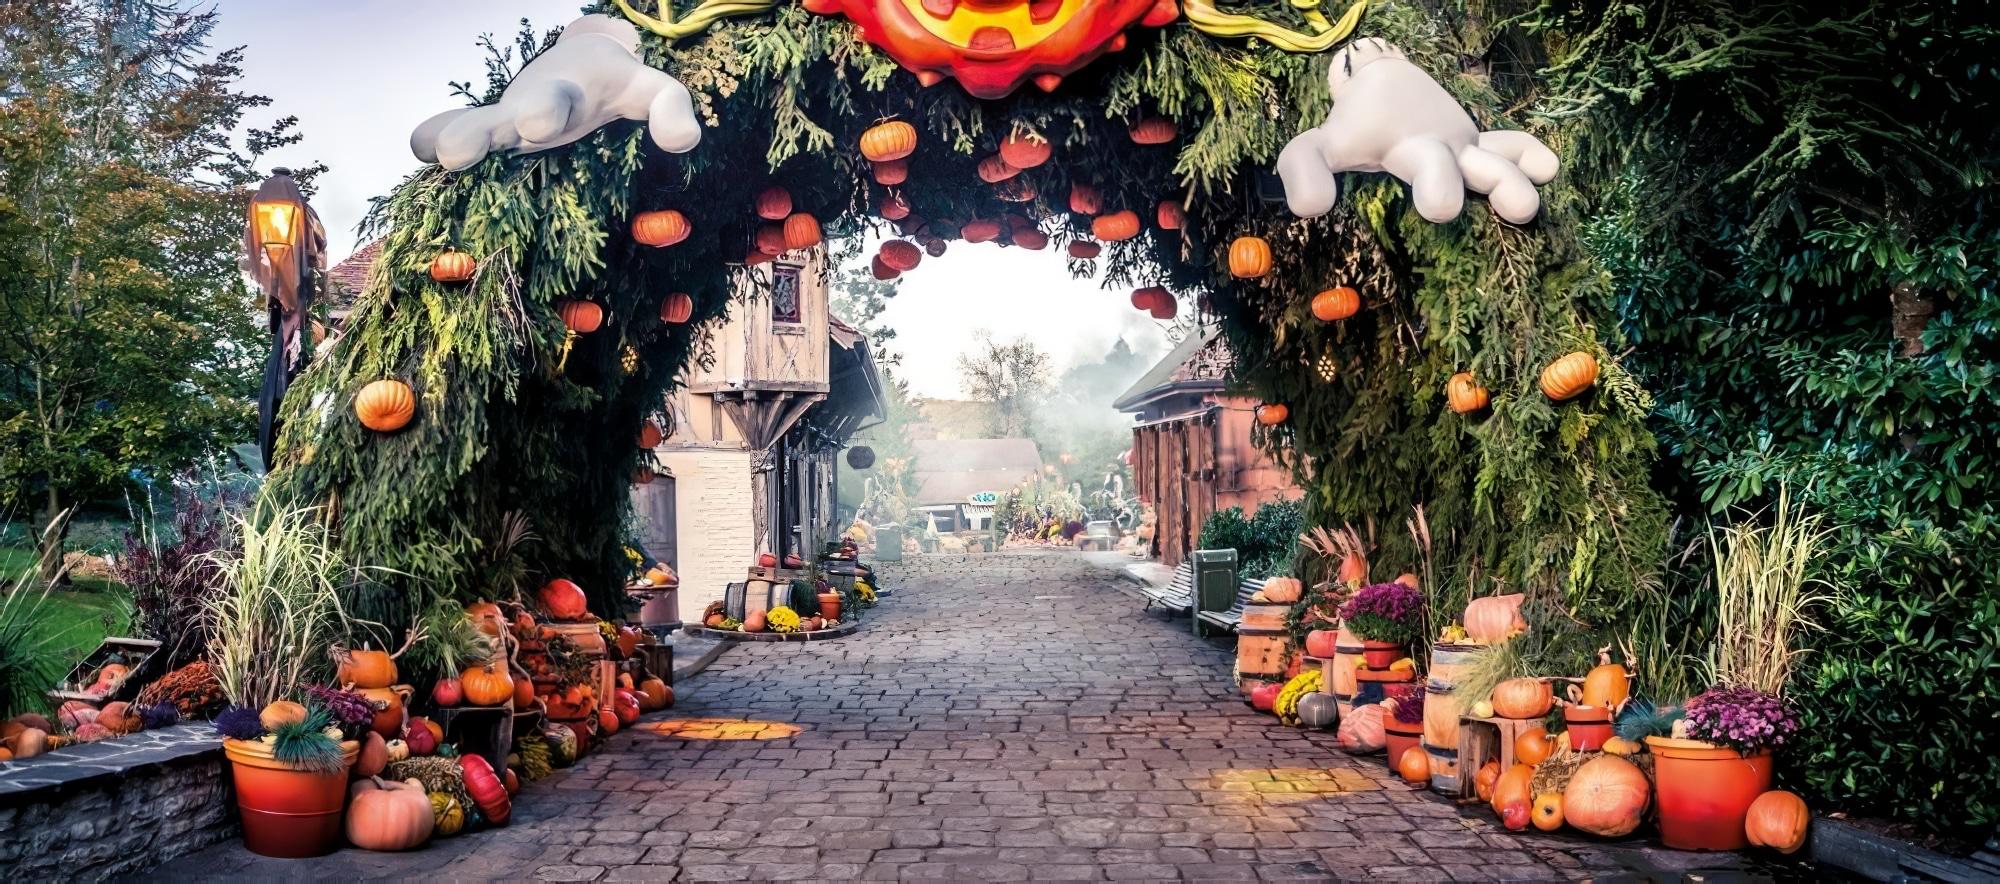 14 parcs d'attraction où fêter Halloween